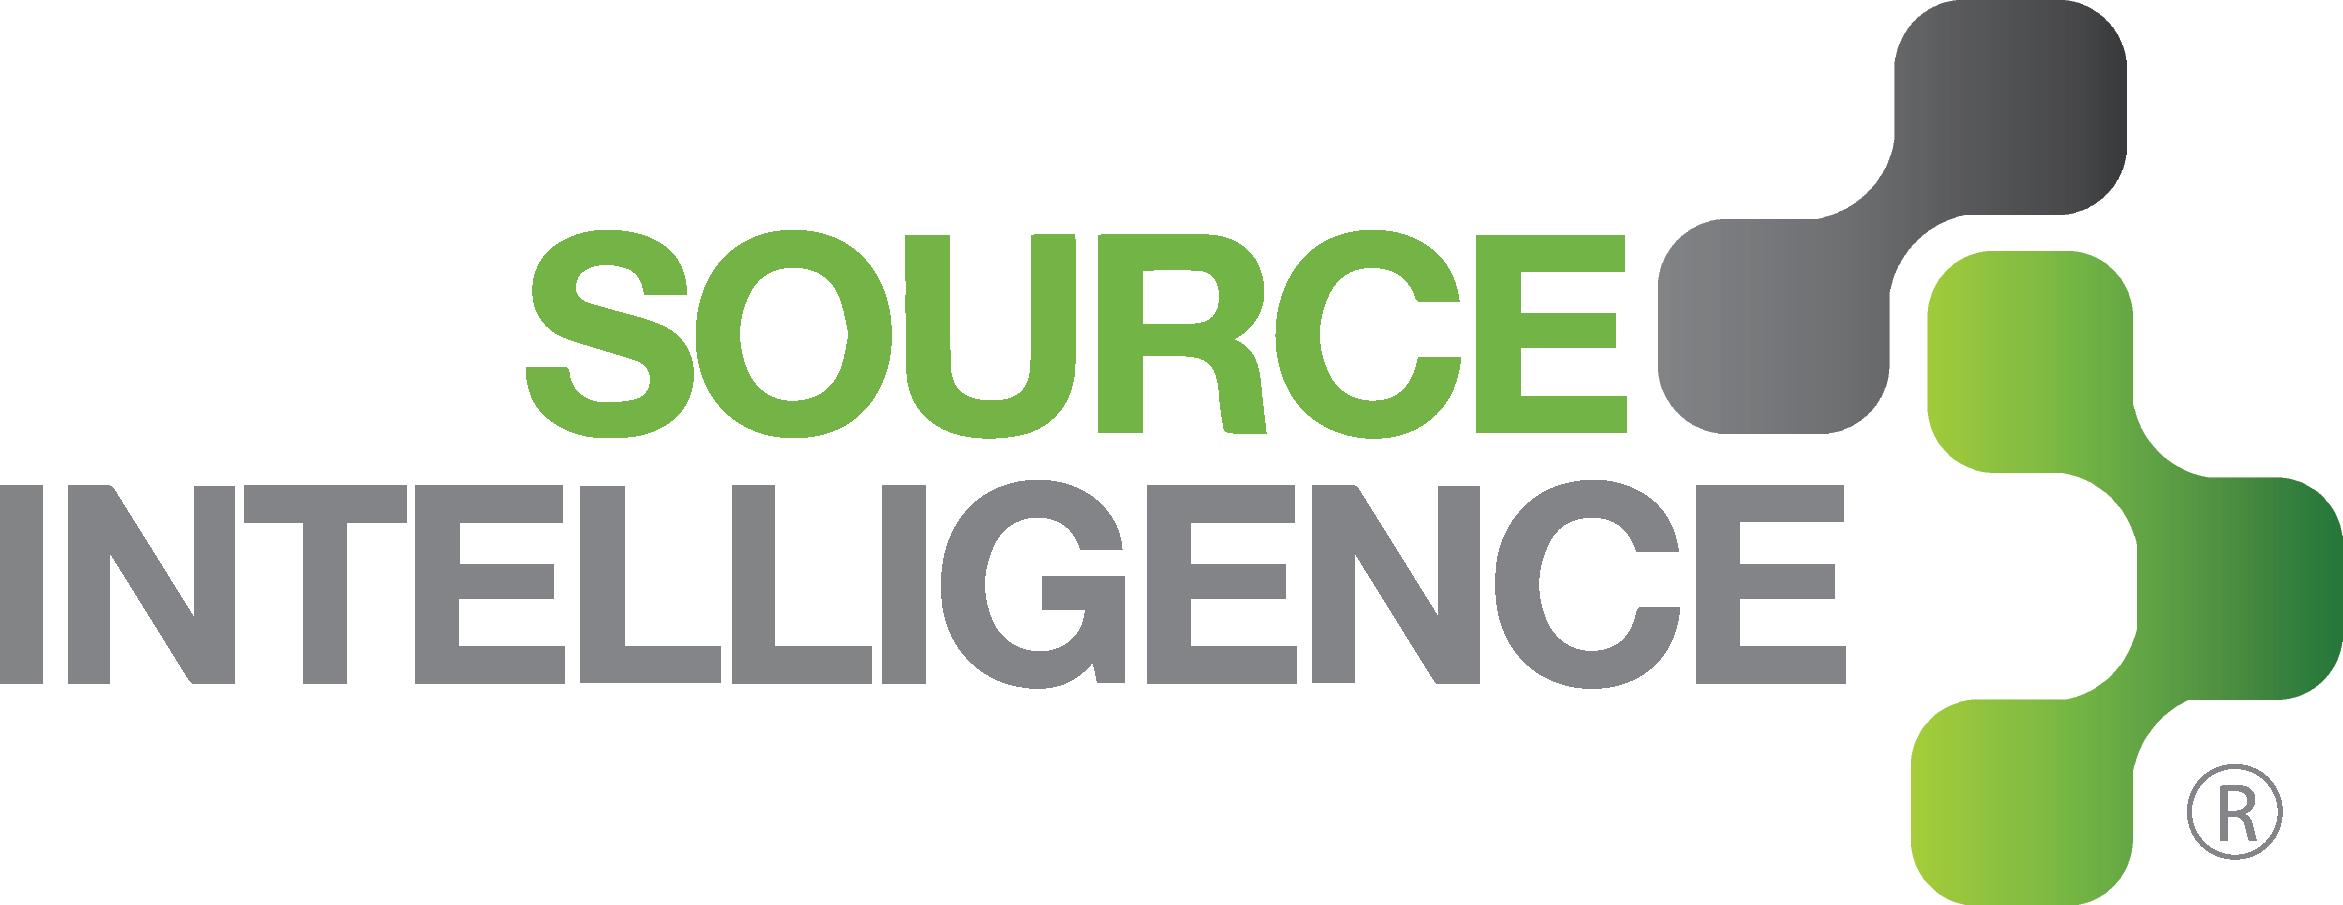 Source Intelligence company logo